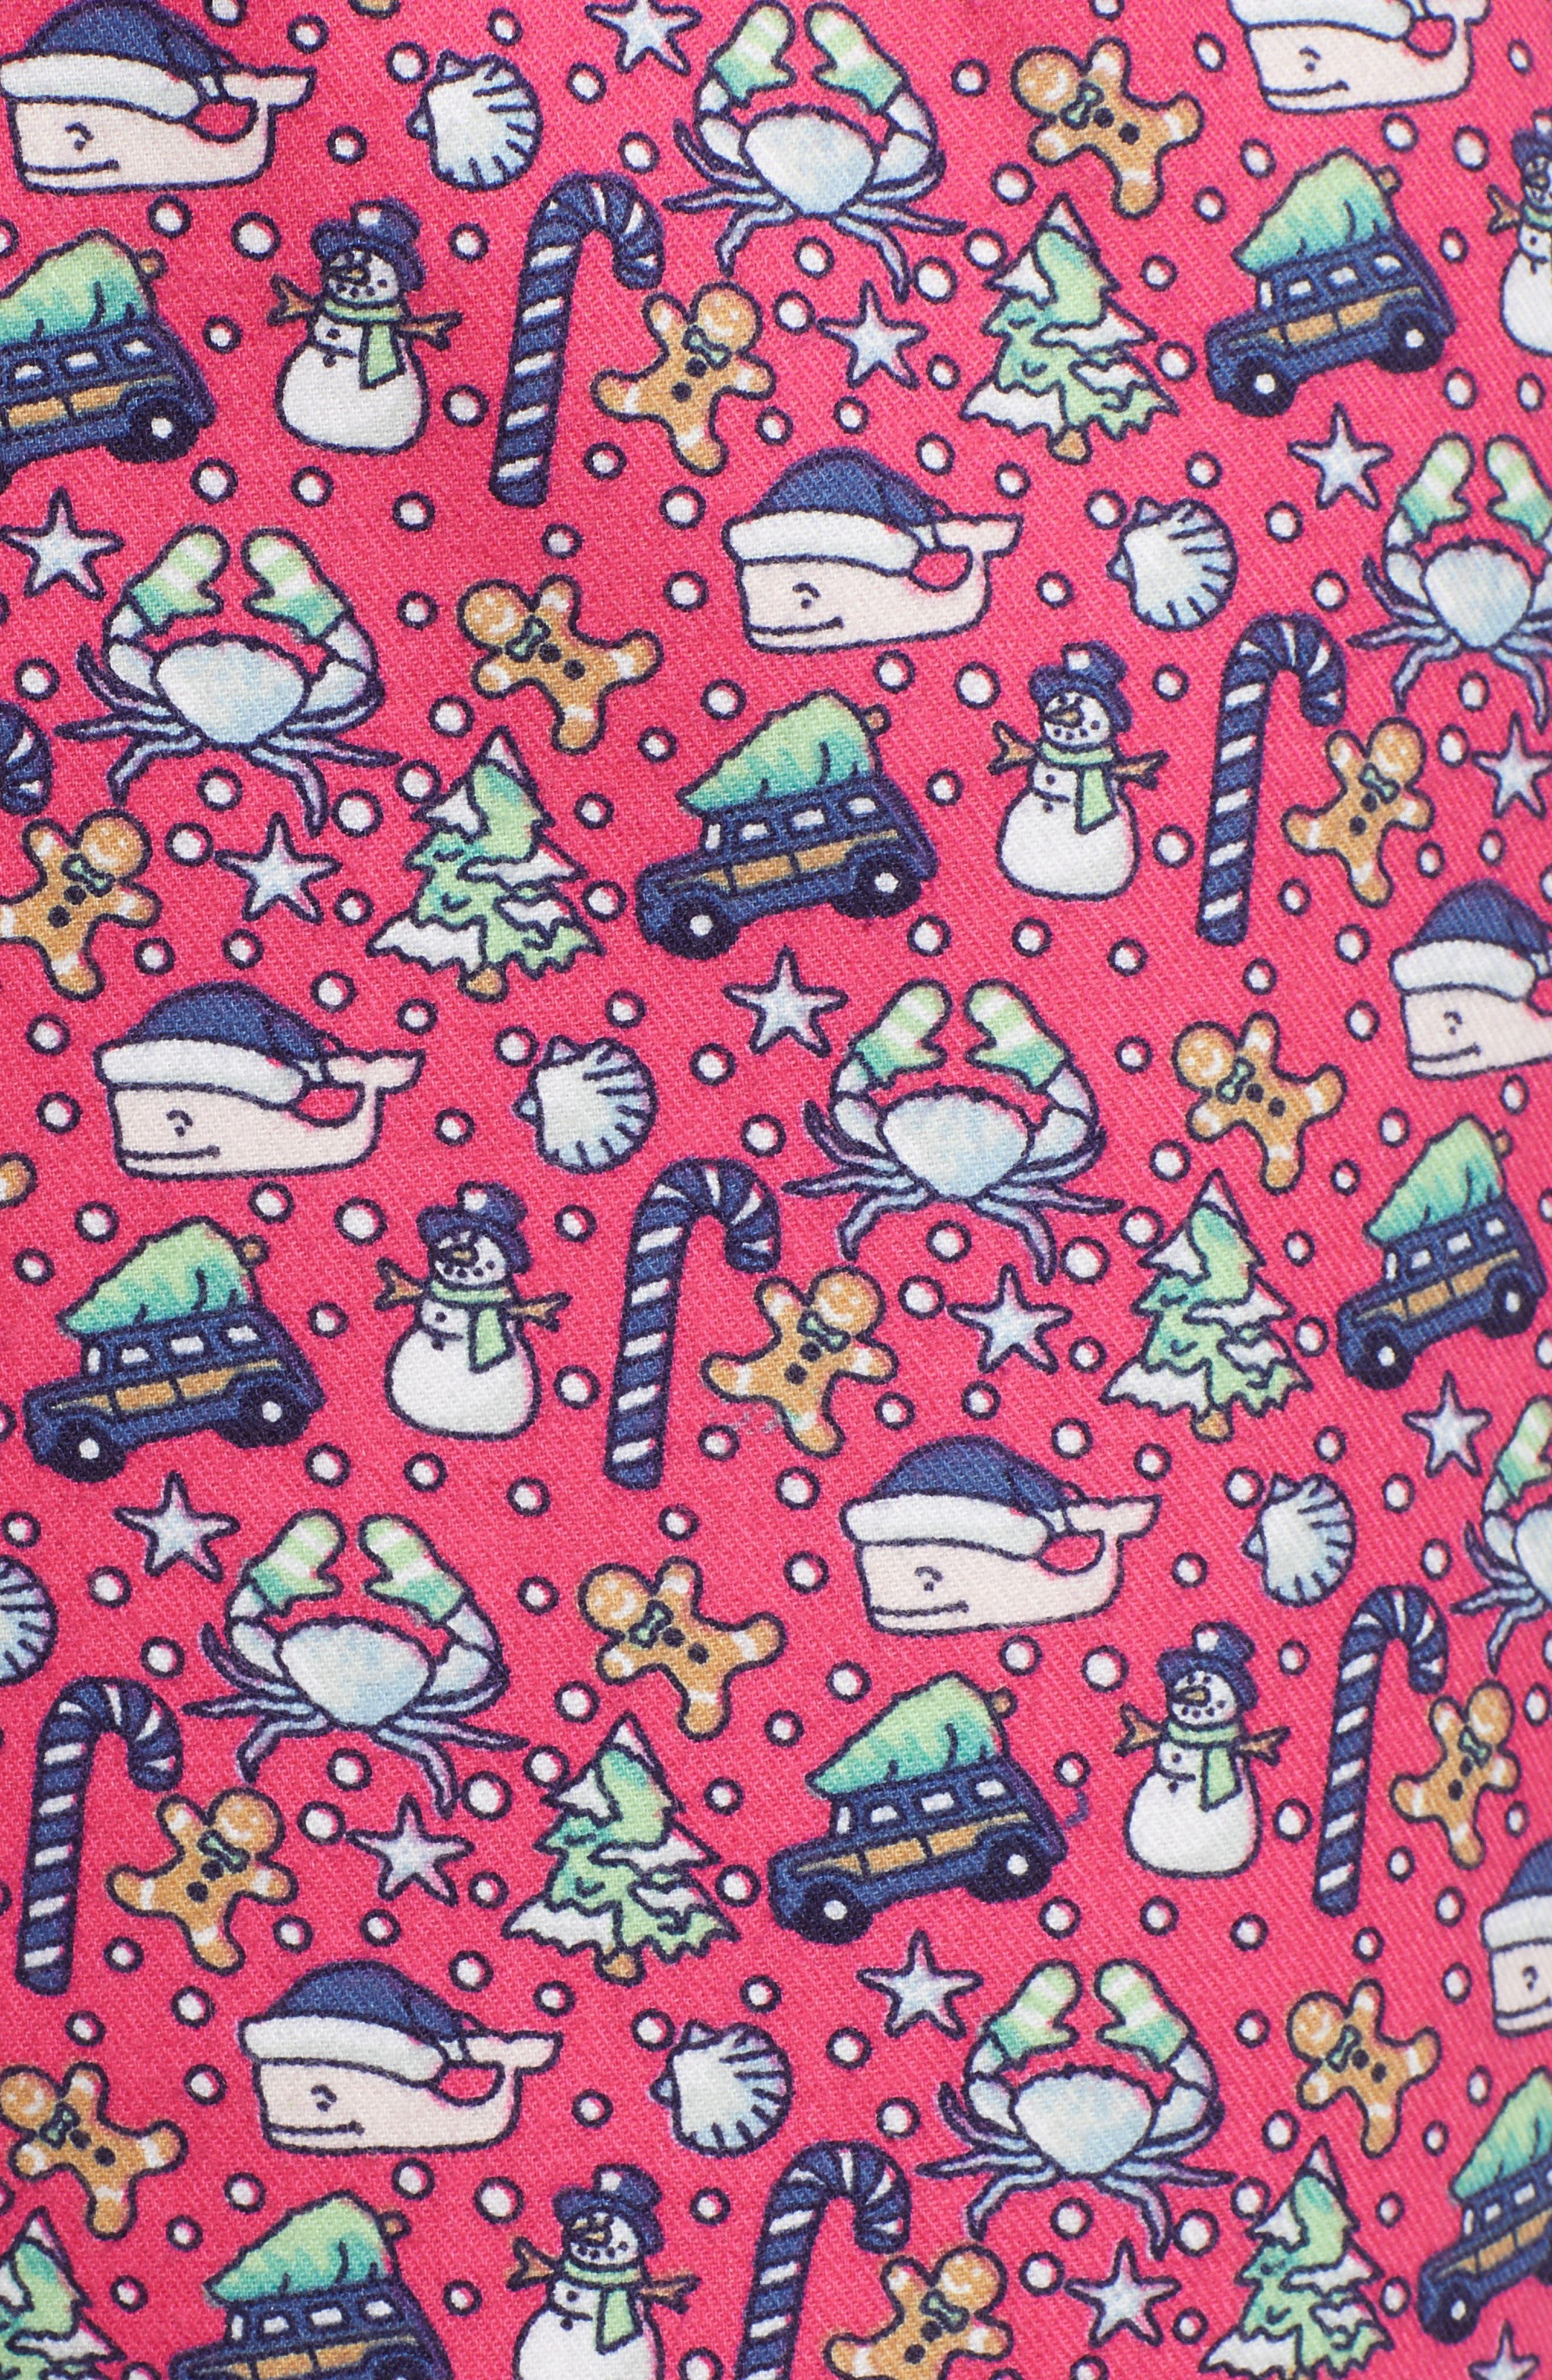 Holiday Print Lounge Pants,                             Alternate thumbnail 5, color,                             GOJI BERRY